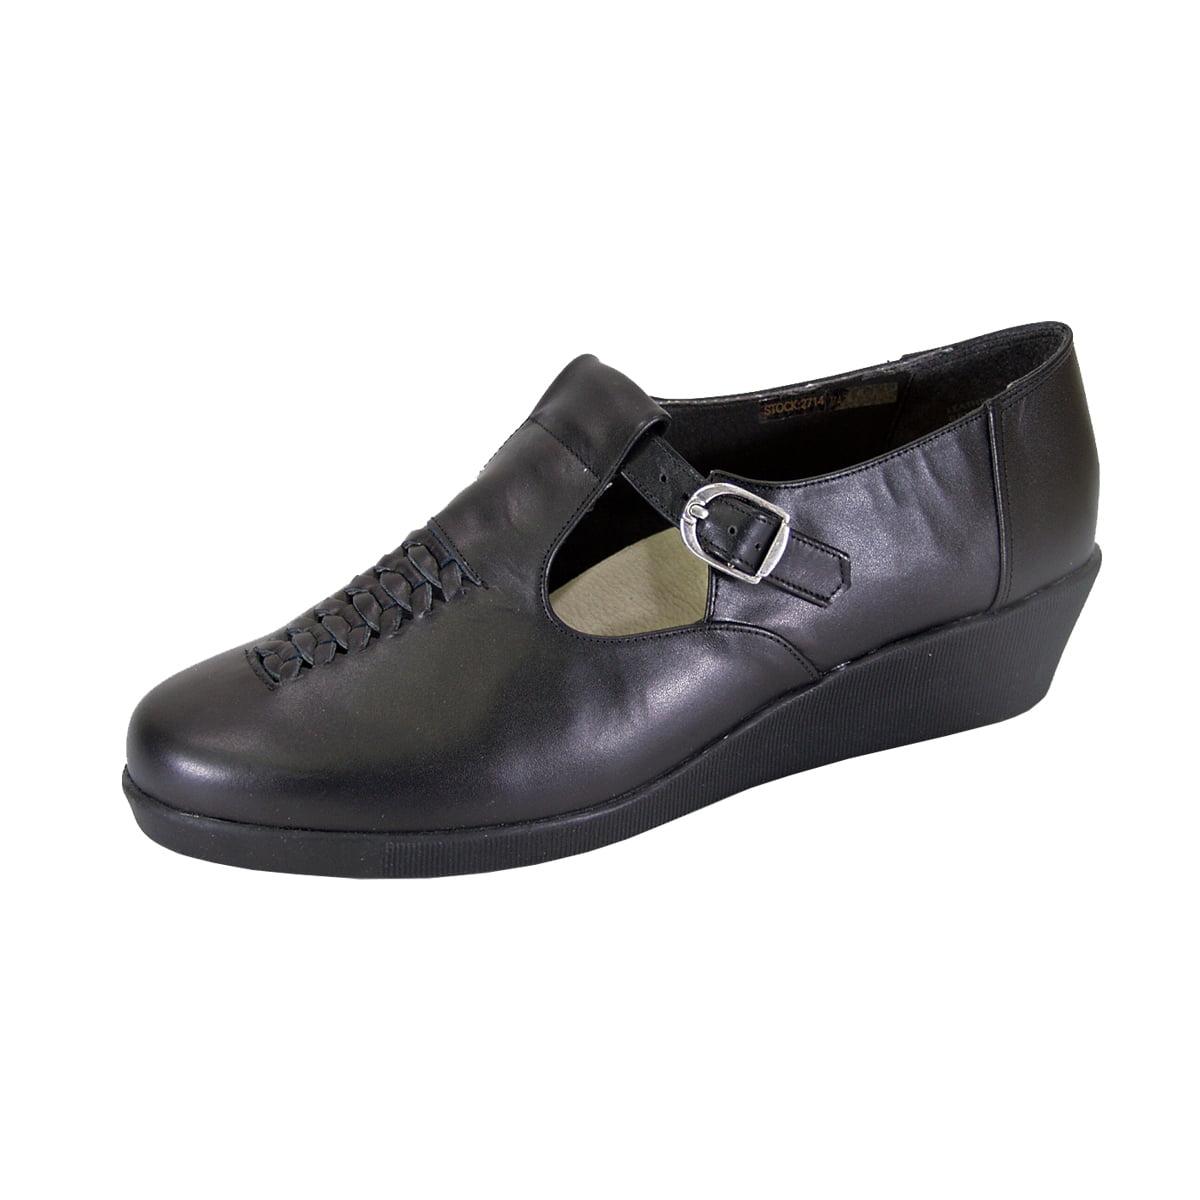 Strap Leather Shoes BLACK 8.5 - Walmart